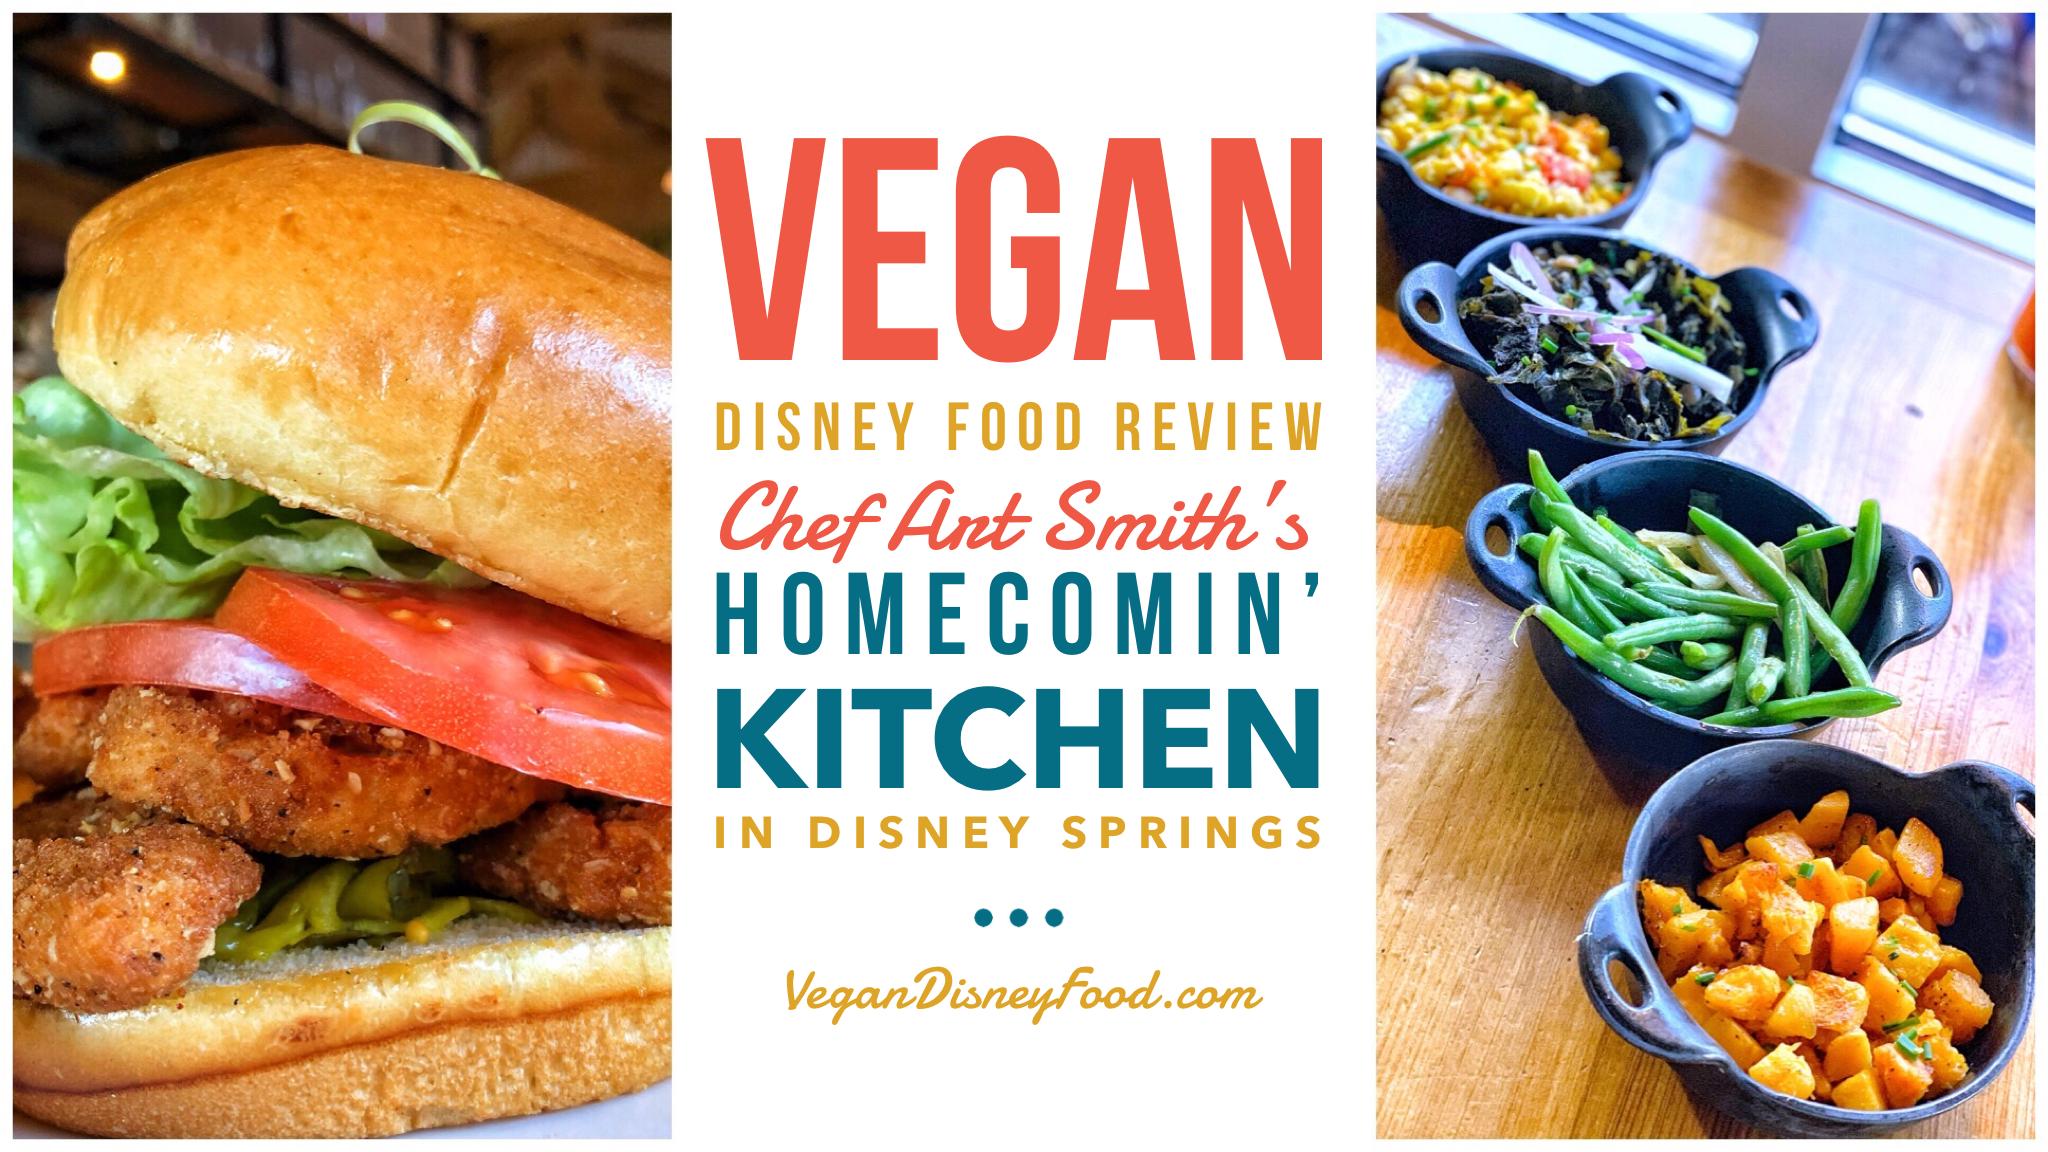 Vegan Disney Food Review Homecomin Kitchen In Disney Springs